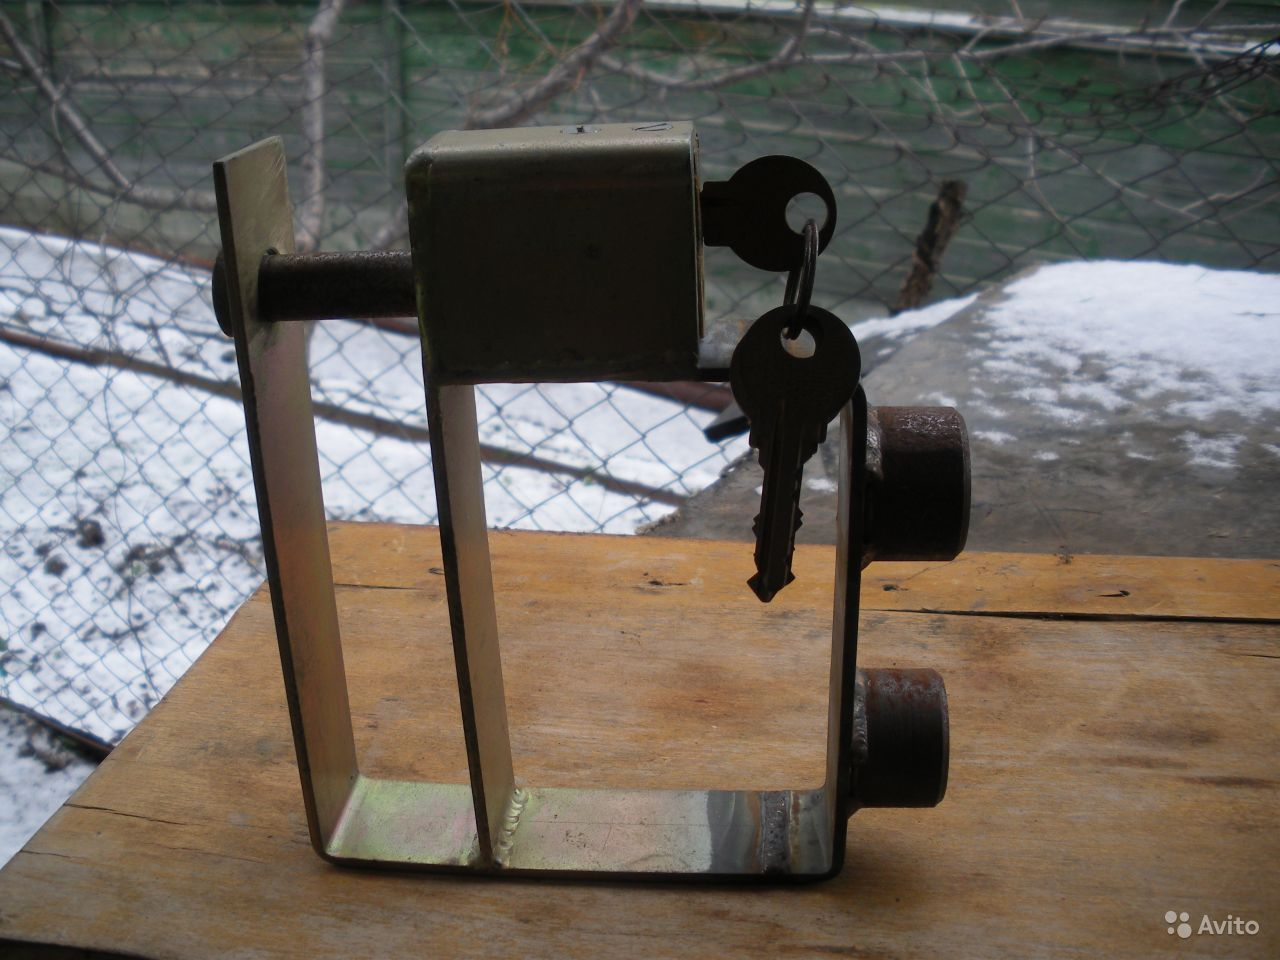 Противоугонное устройство своими руками фото